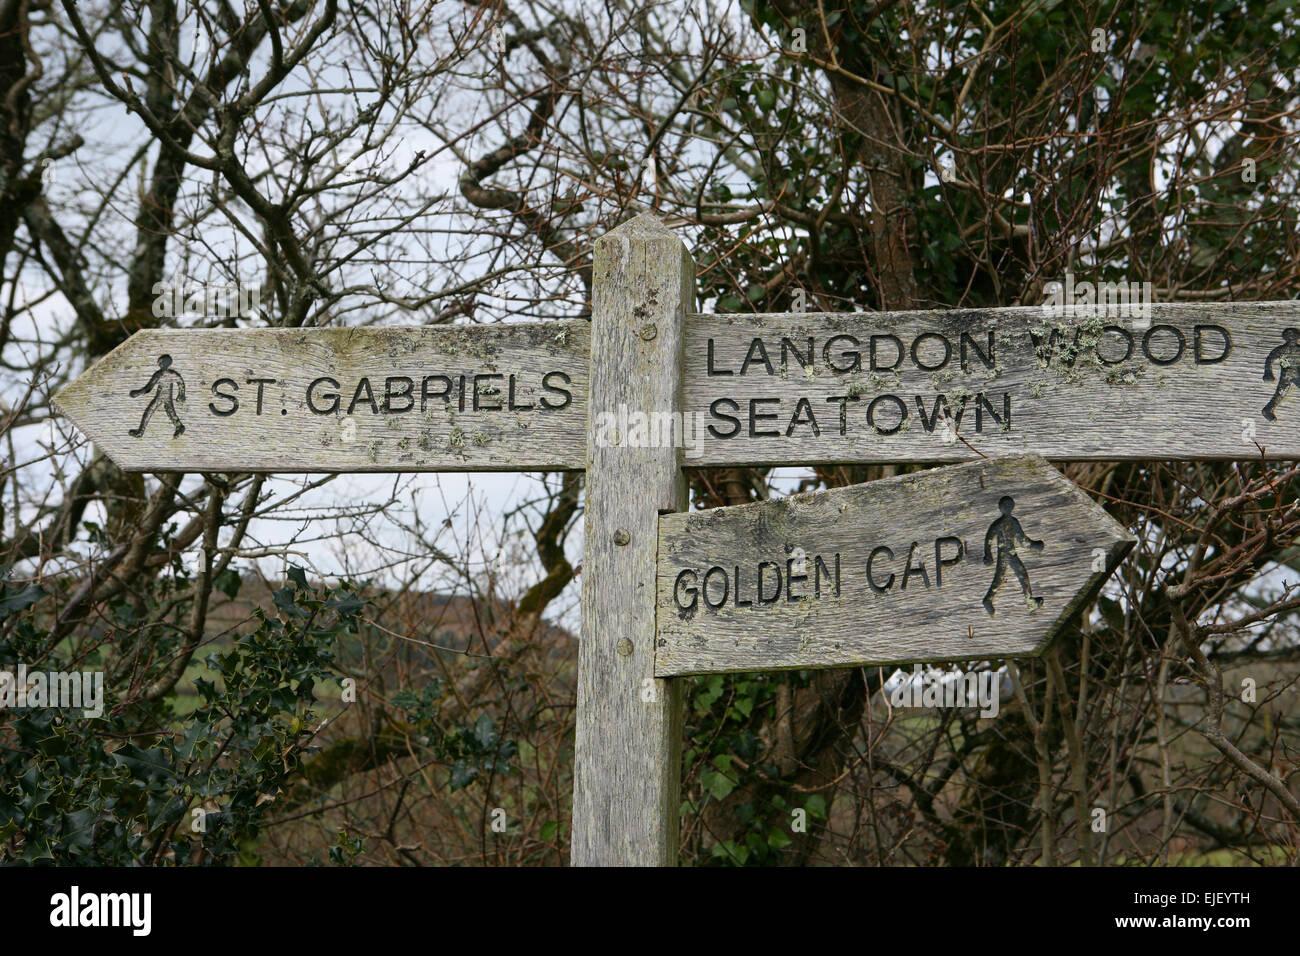 Signpost on the coastal footpath near Seatown - Stock Image